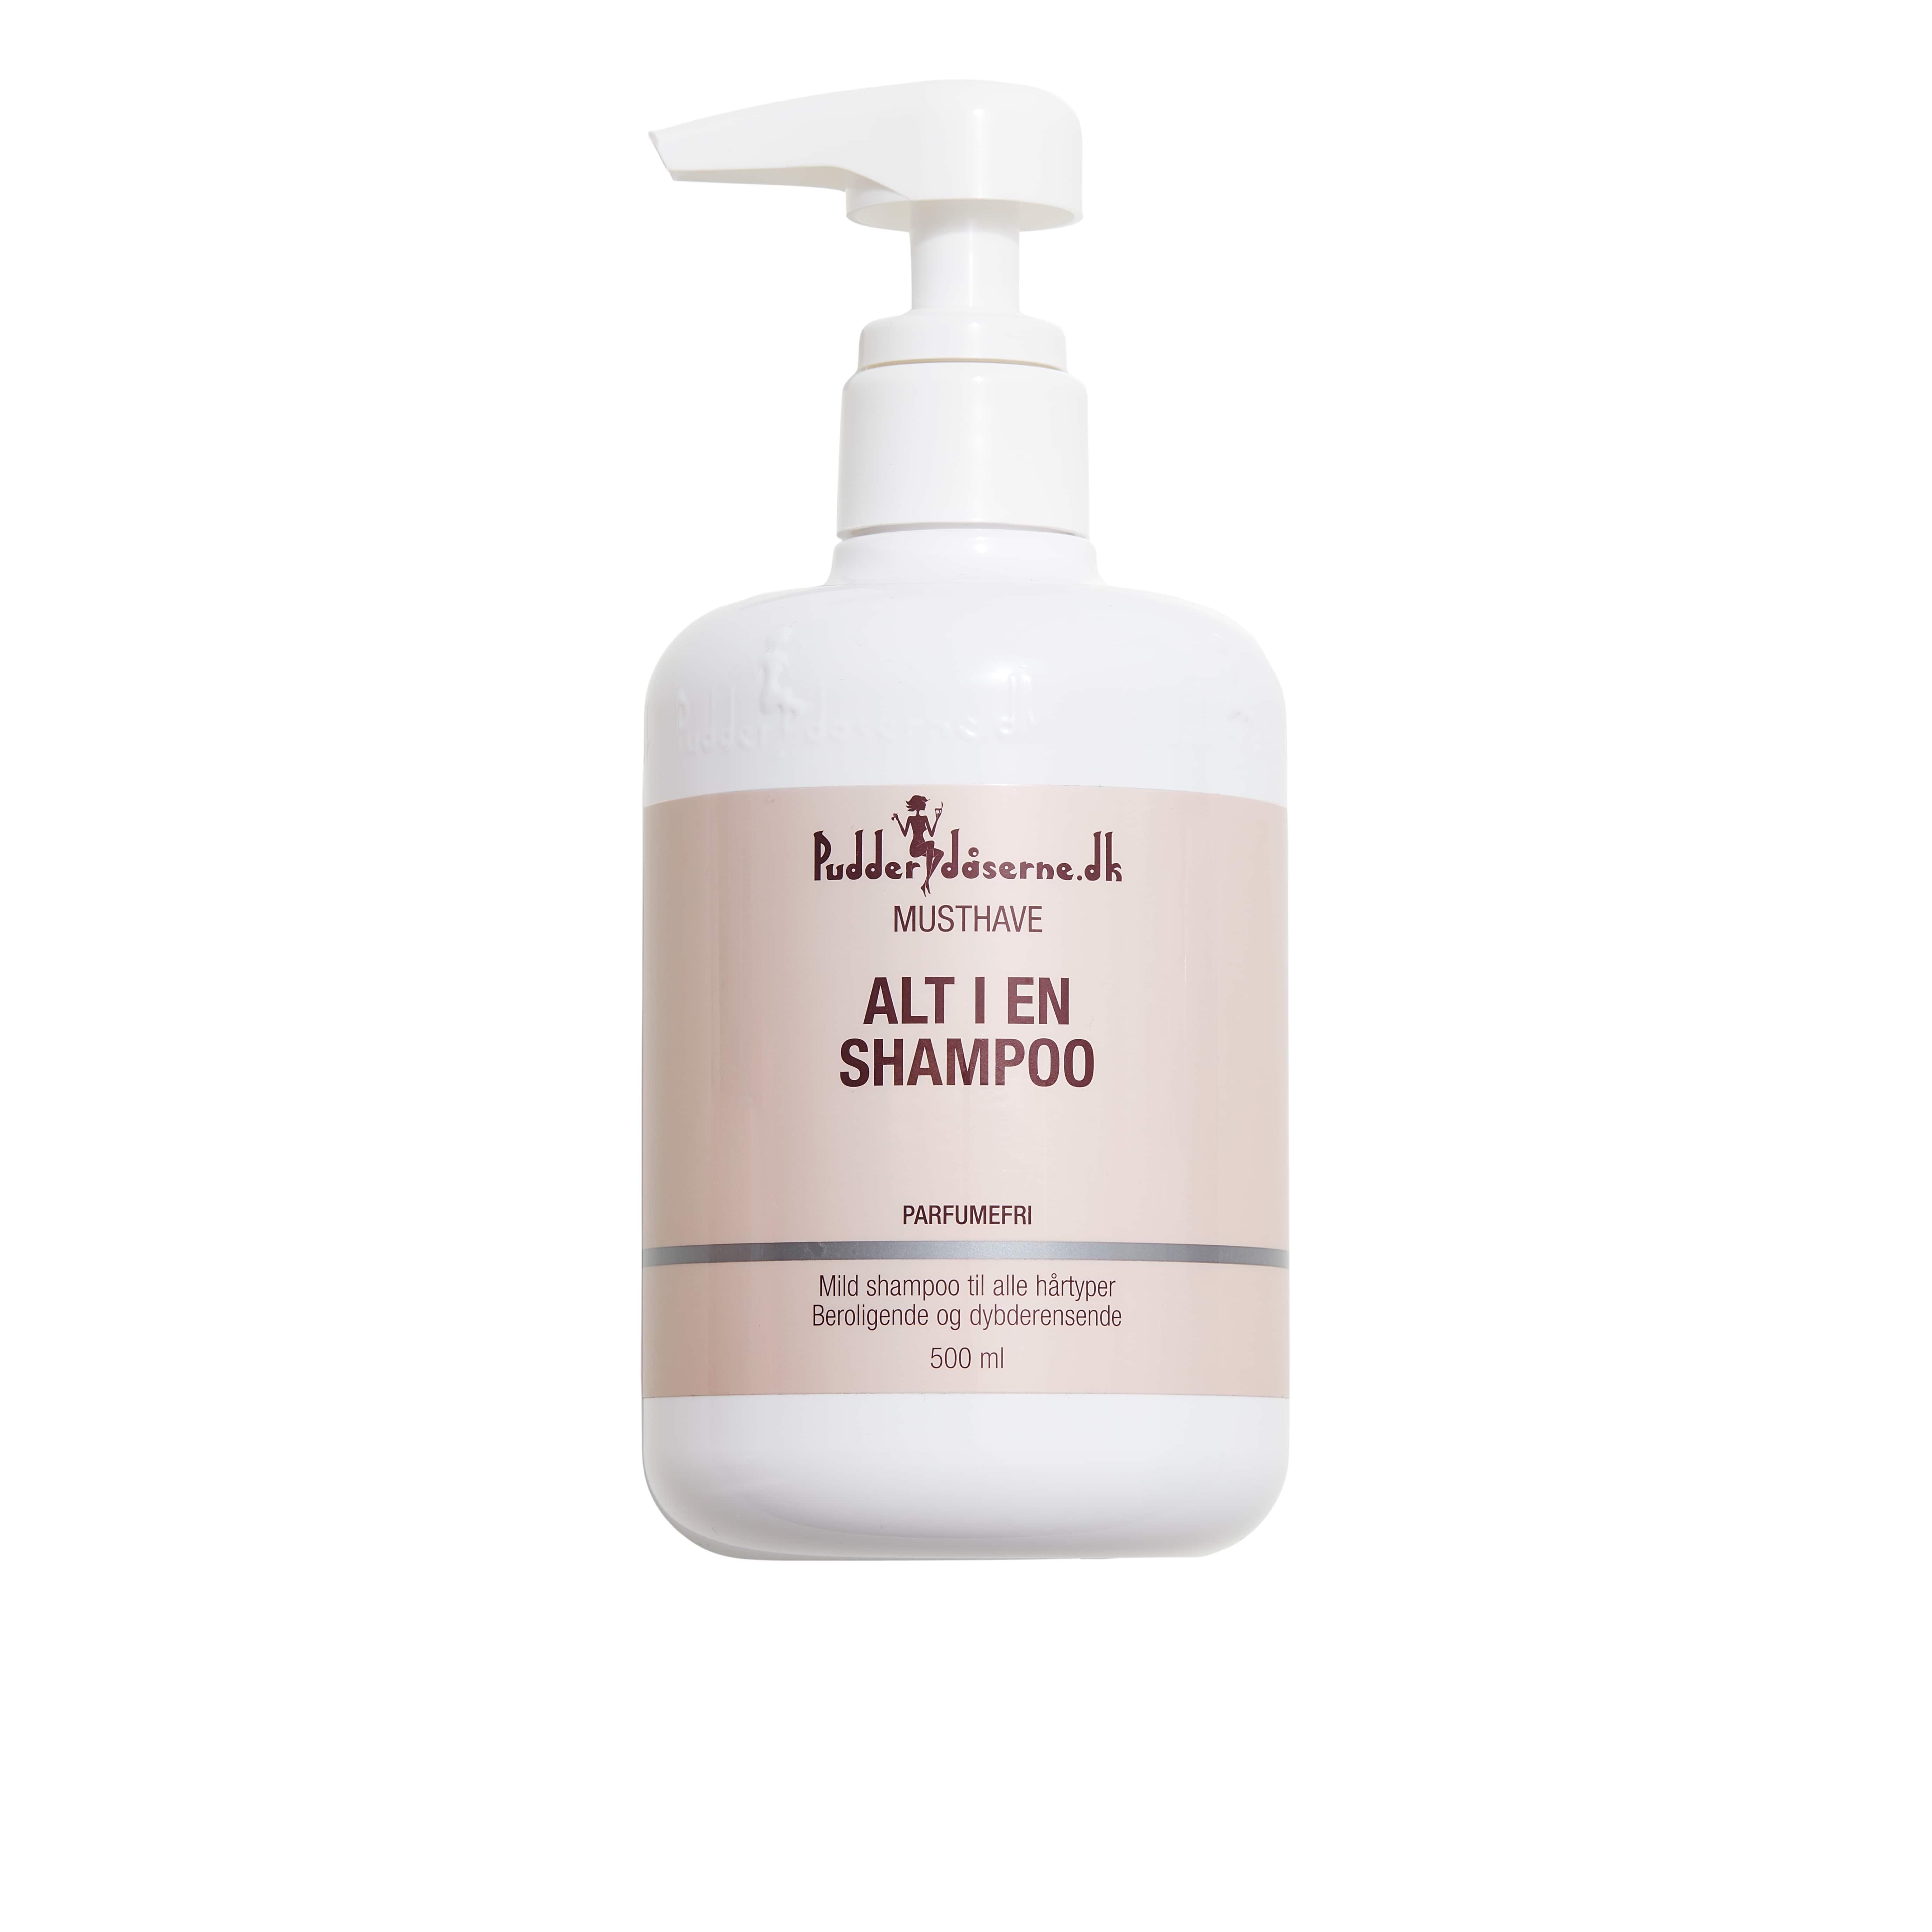 Pudderdåserne Alt i en Shampoo, 500 ml